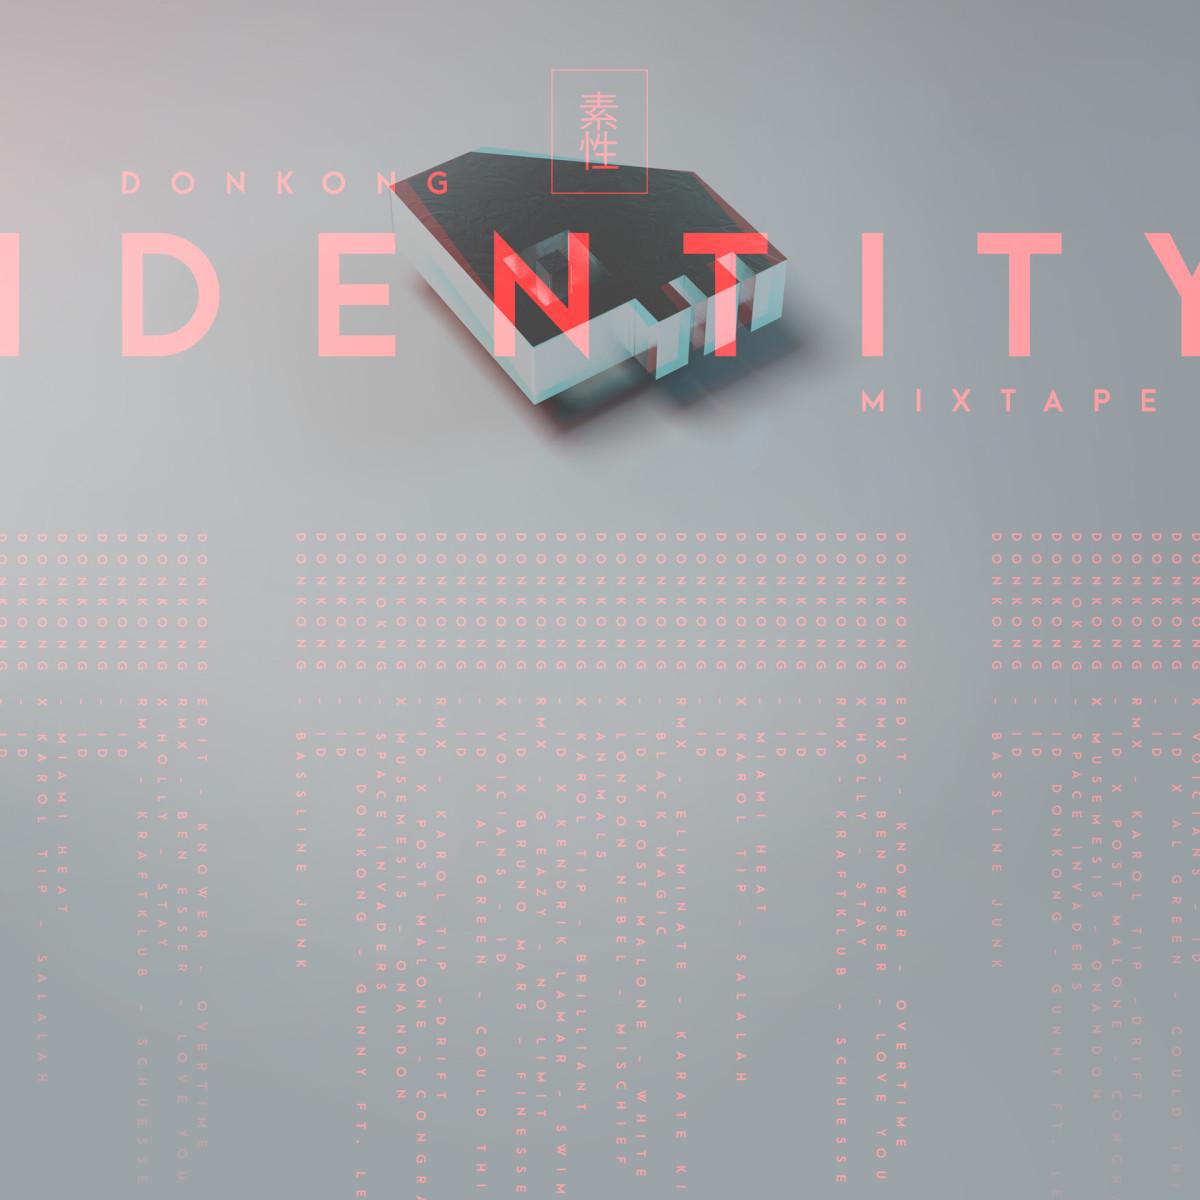 Donkong - Identity Mix - w/ Track Listing.